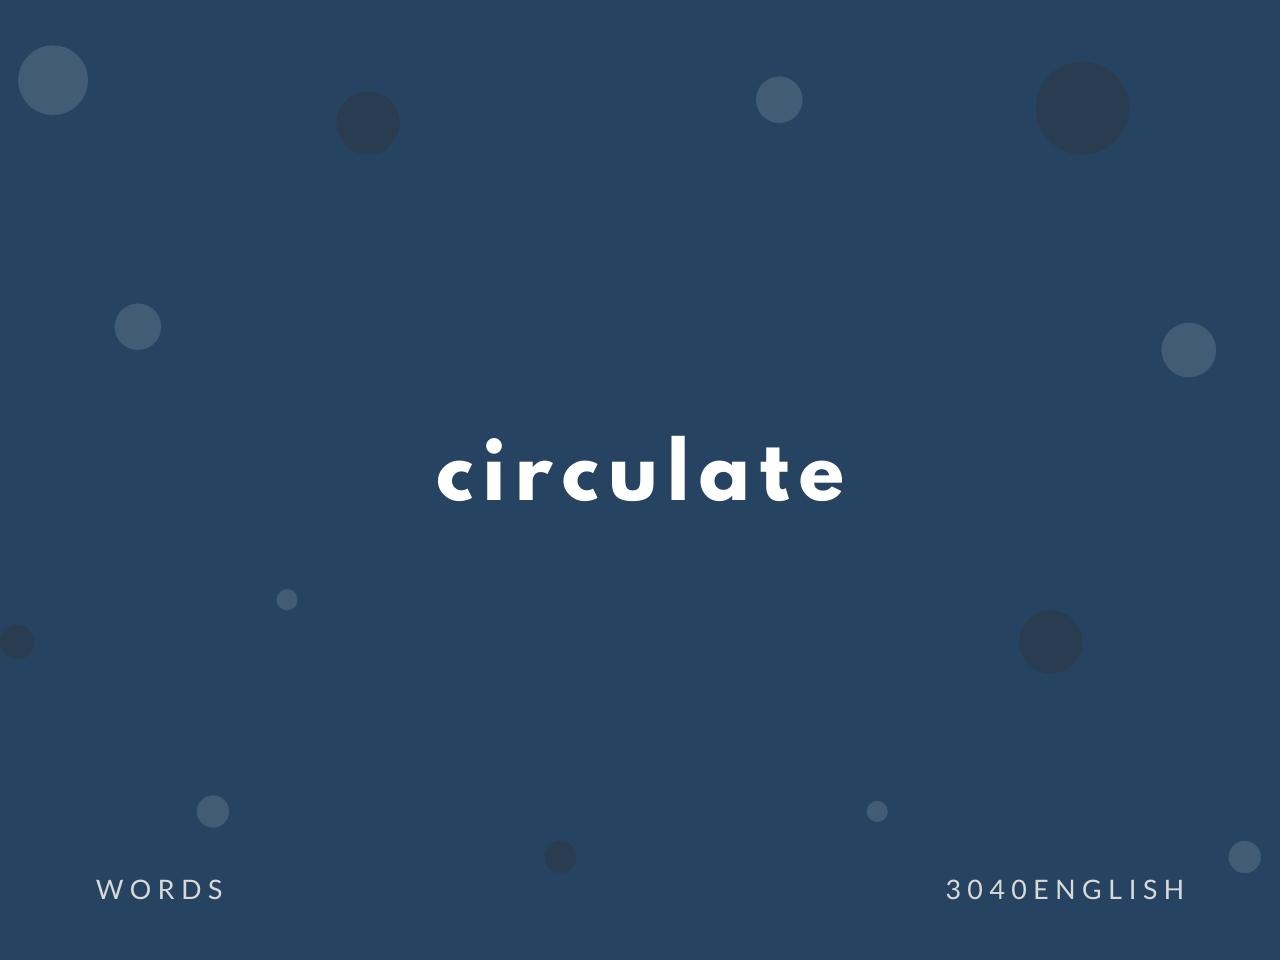 circulate の意味と簡単な使い方【音読用例文あり】